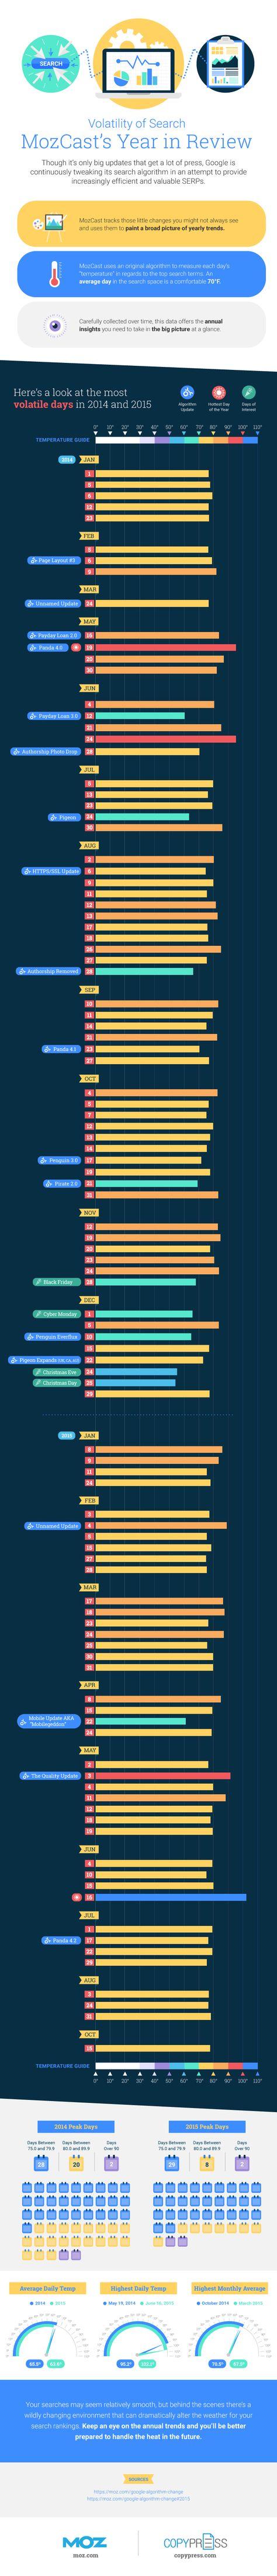 #Infographie : La Météo #SEO 2015 - O.Andrieu Abondance